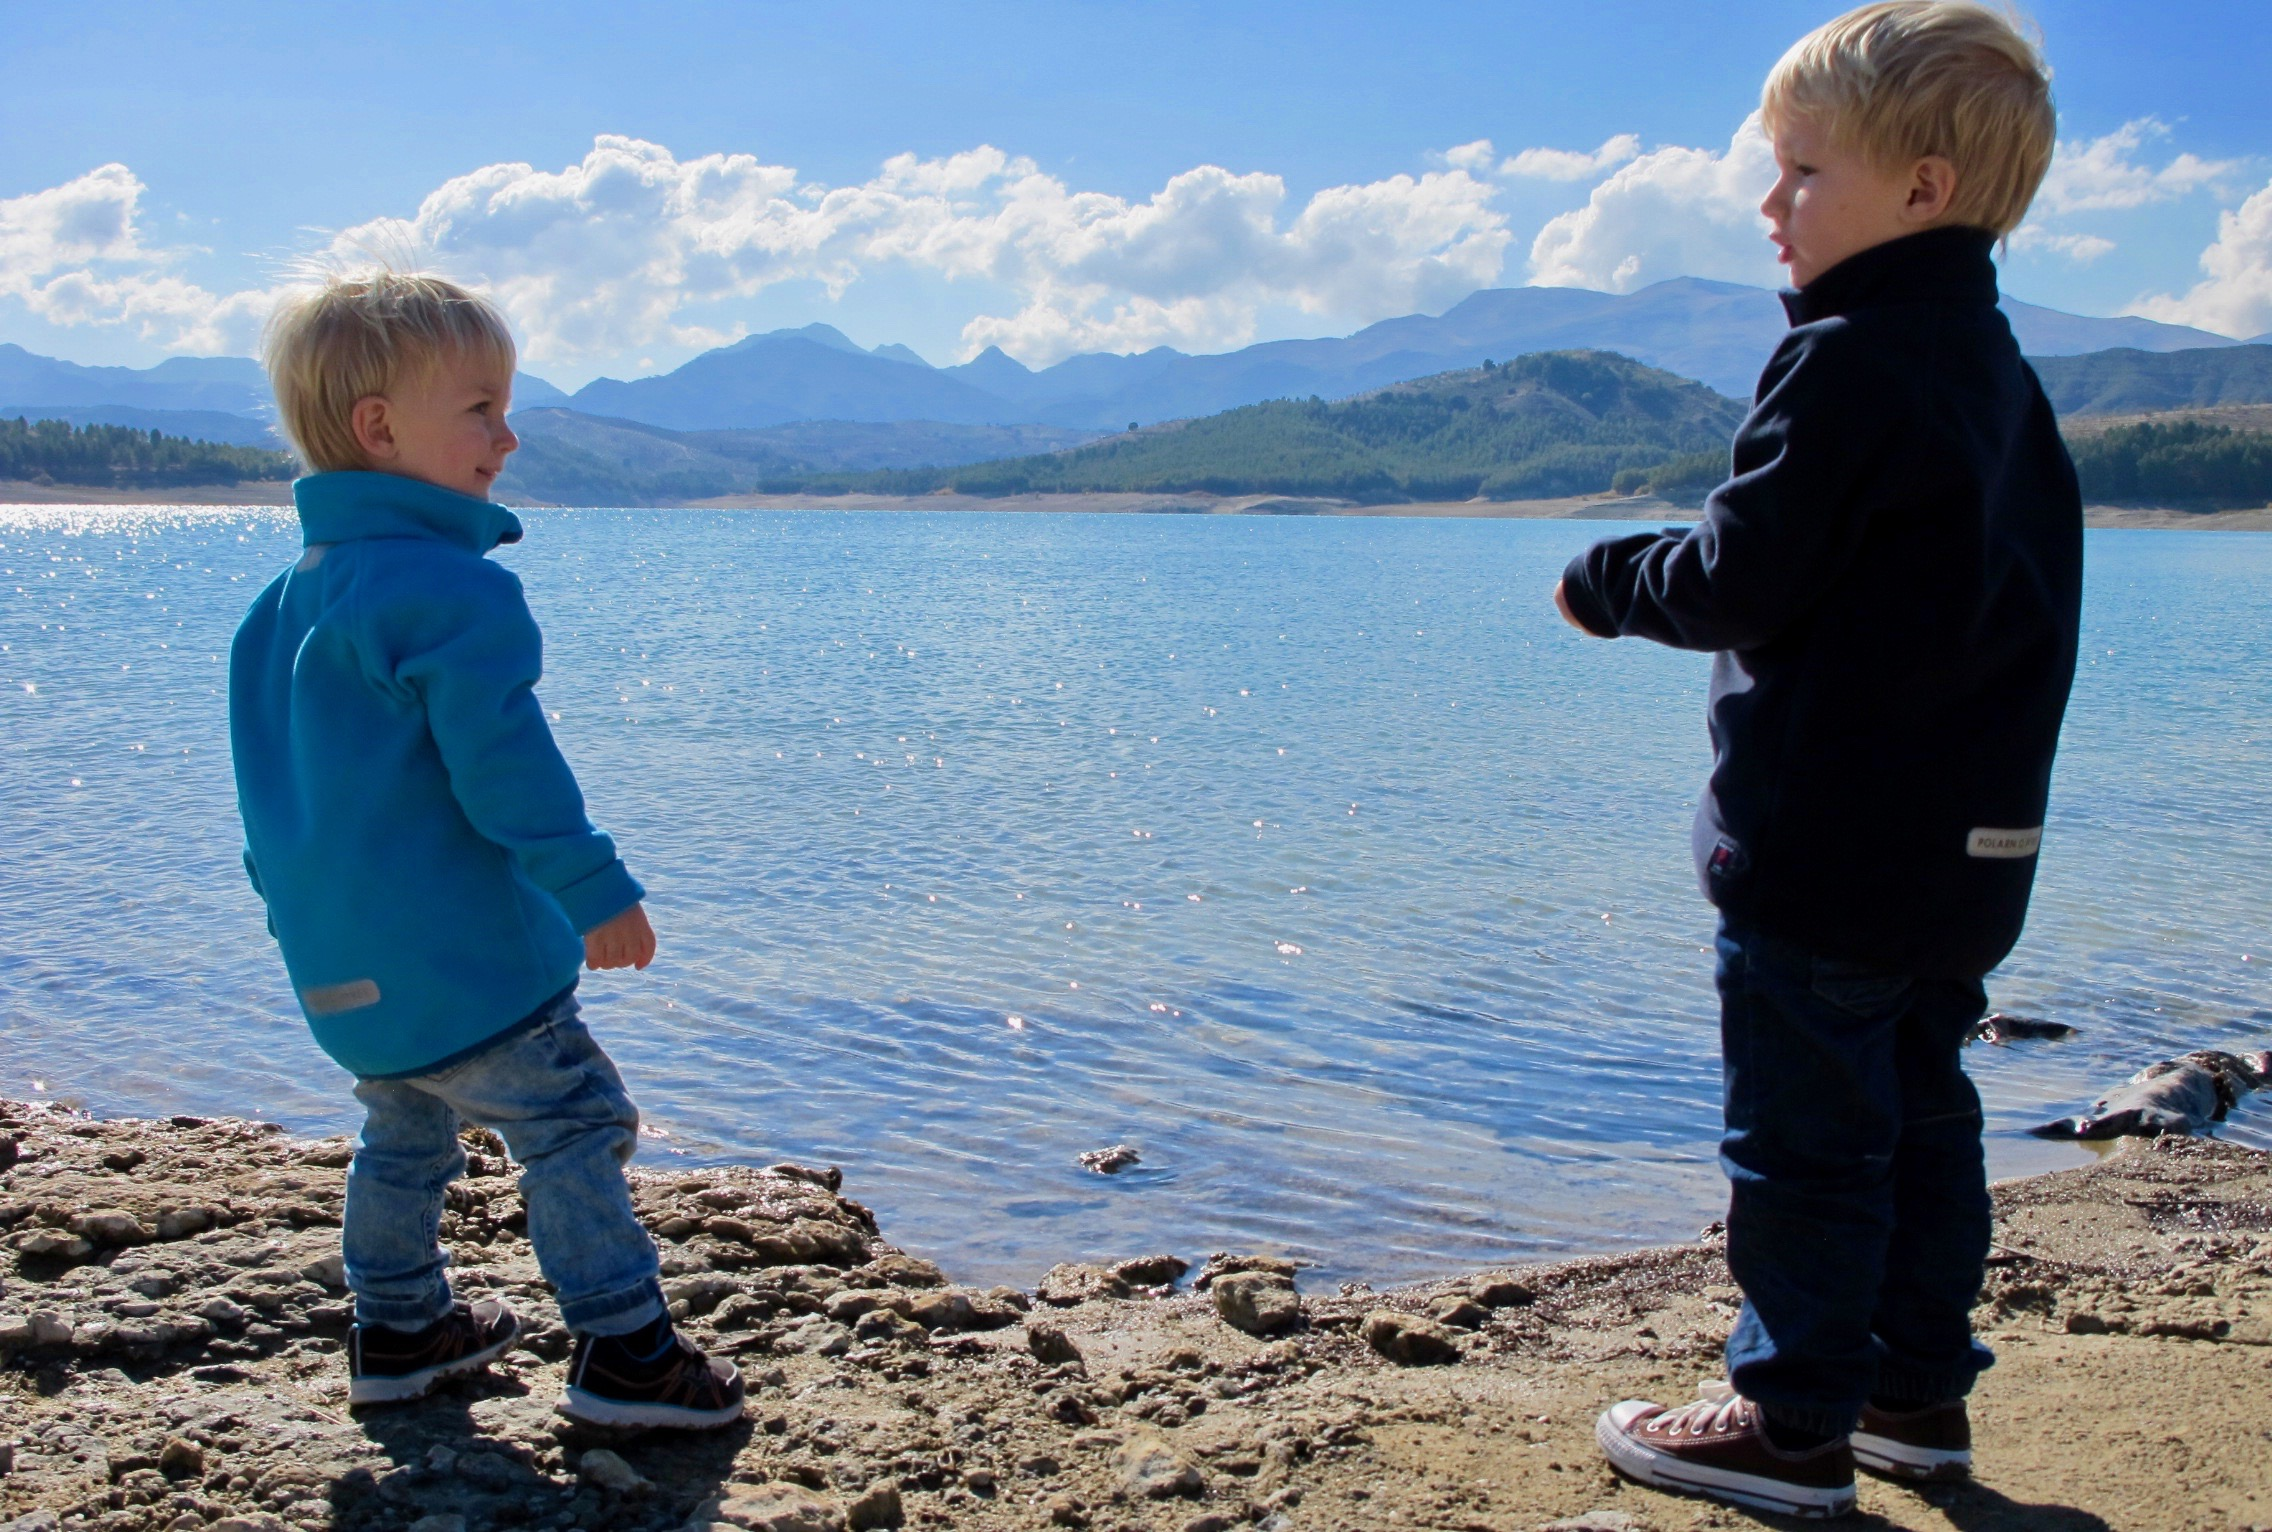 The children play beside the lake Los Bermejales